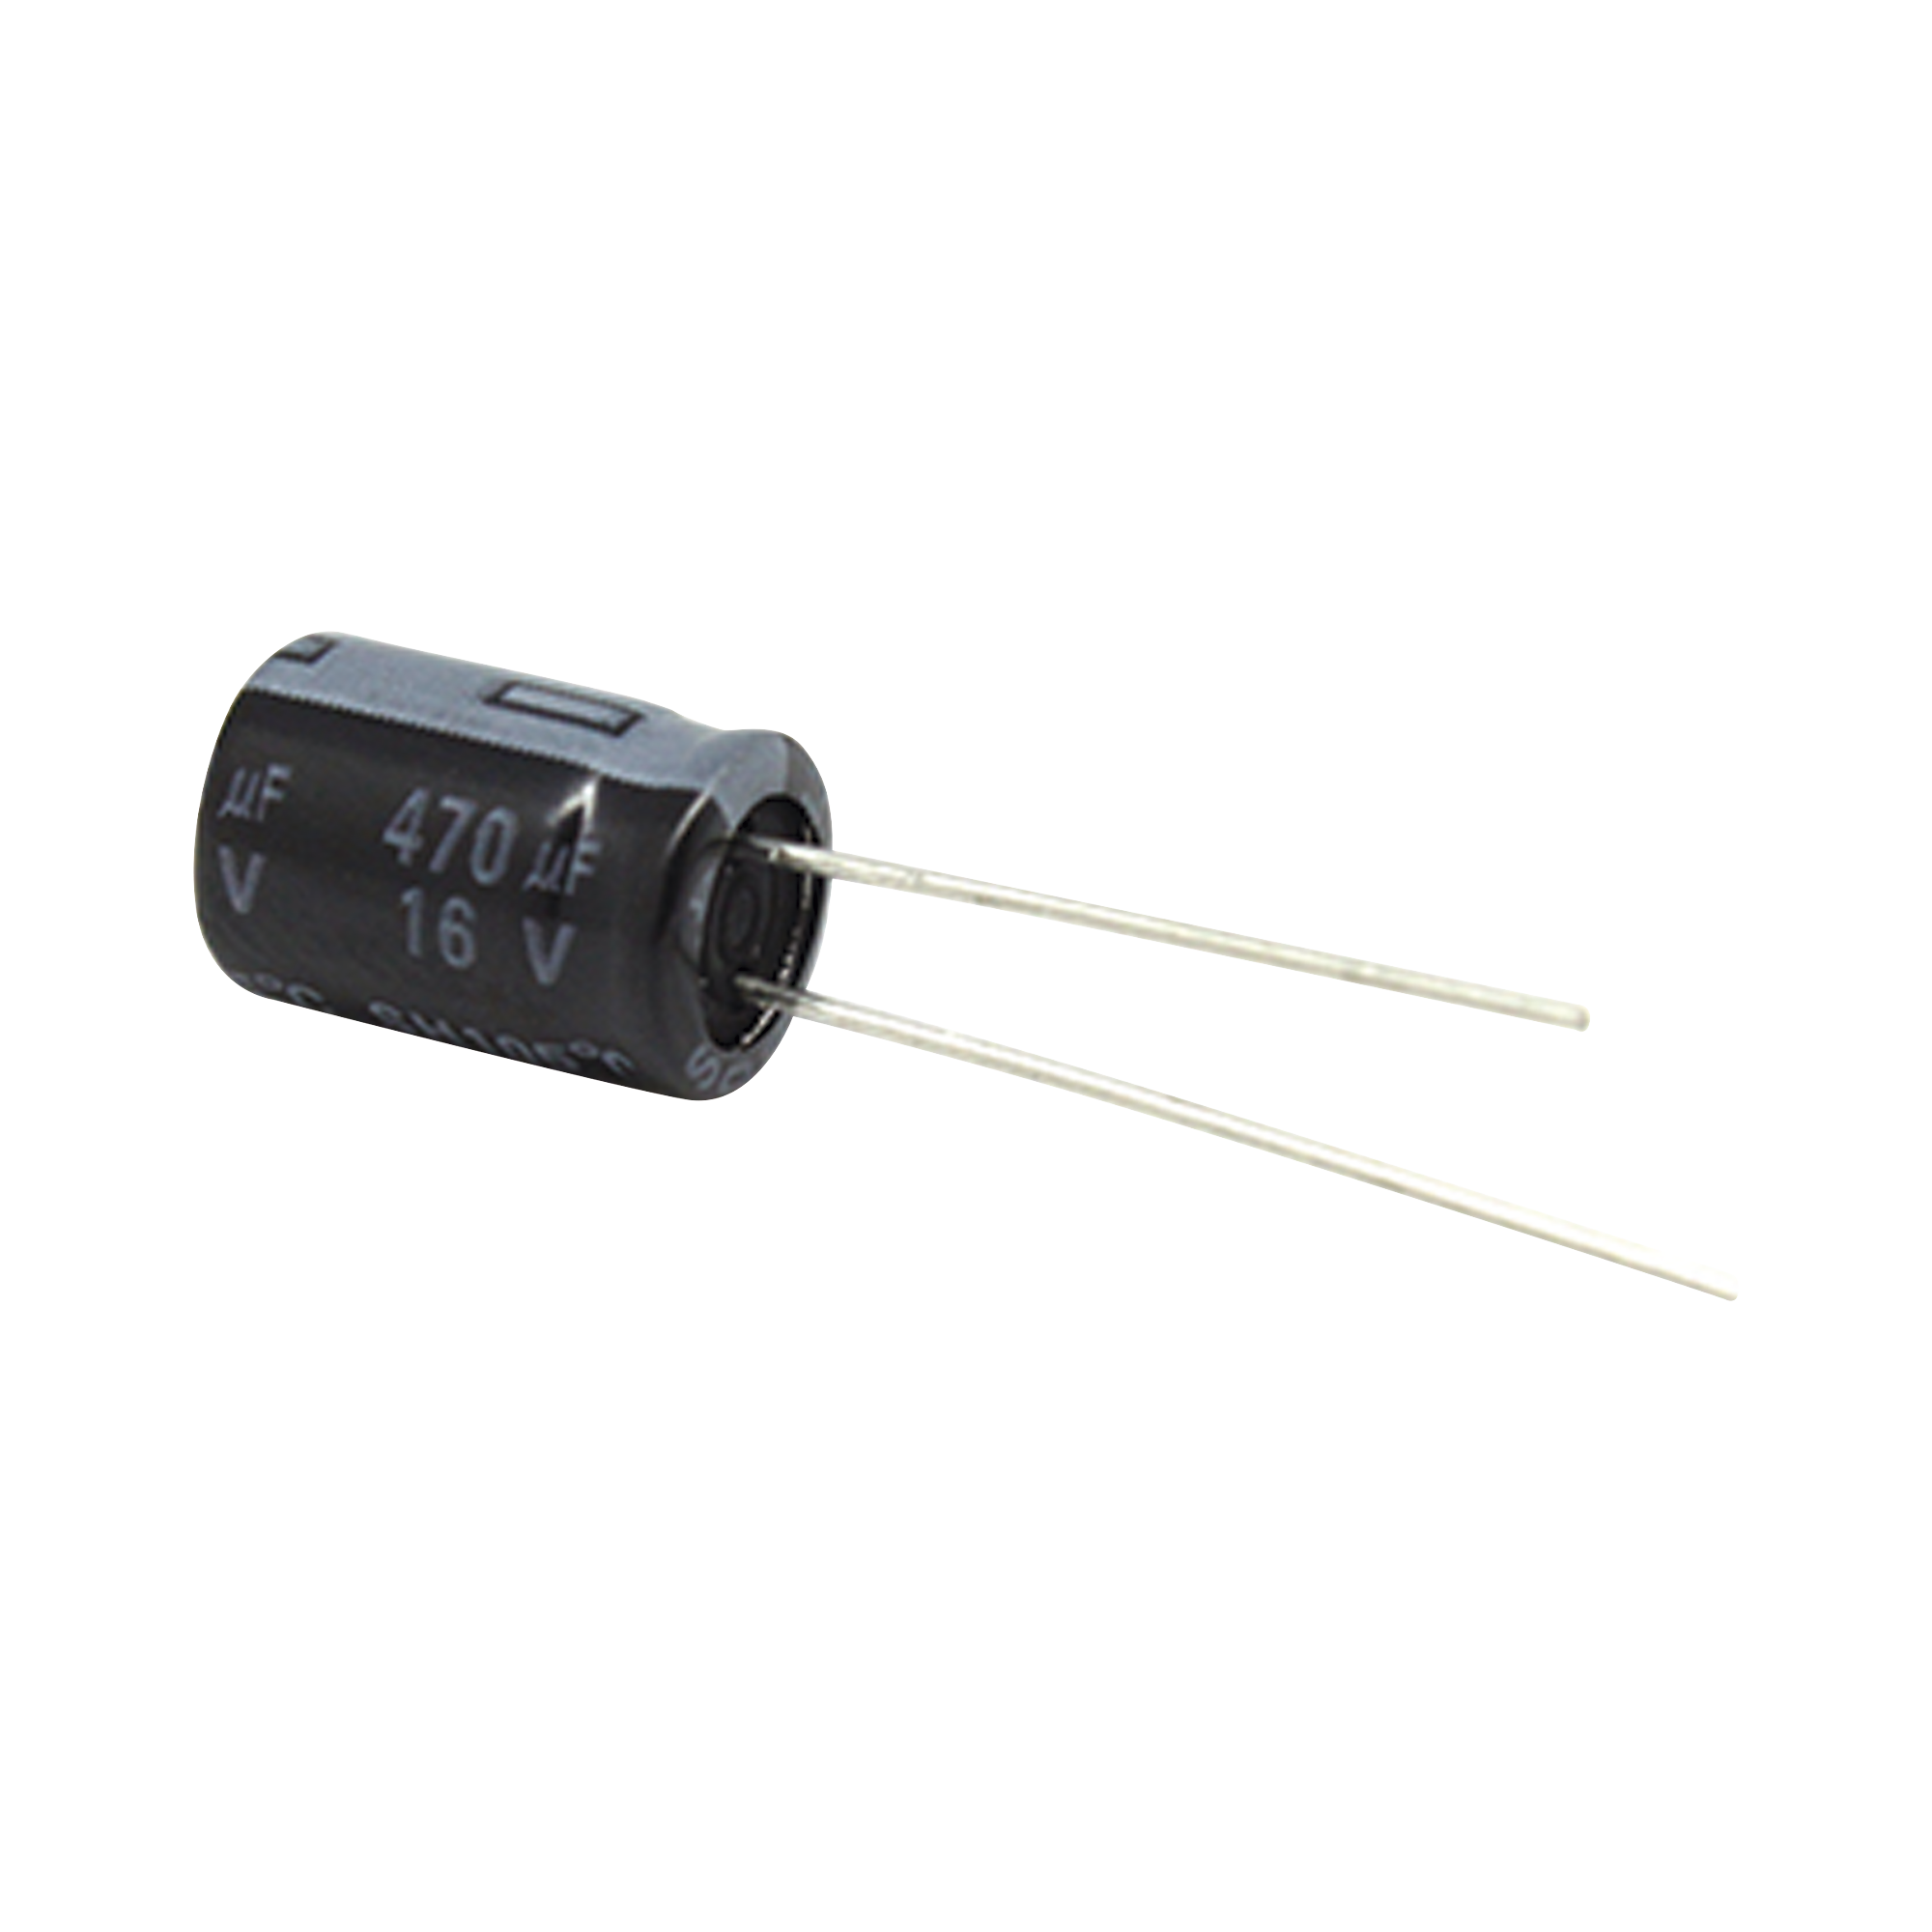 Capacitor Electrolitico de Aluminio, 470 ?Fd, 16 Vcd,  8 x 11 mm, 105 ?C.